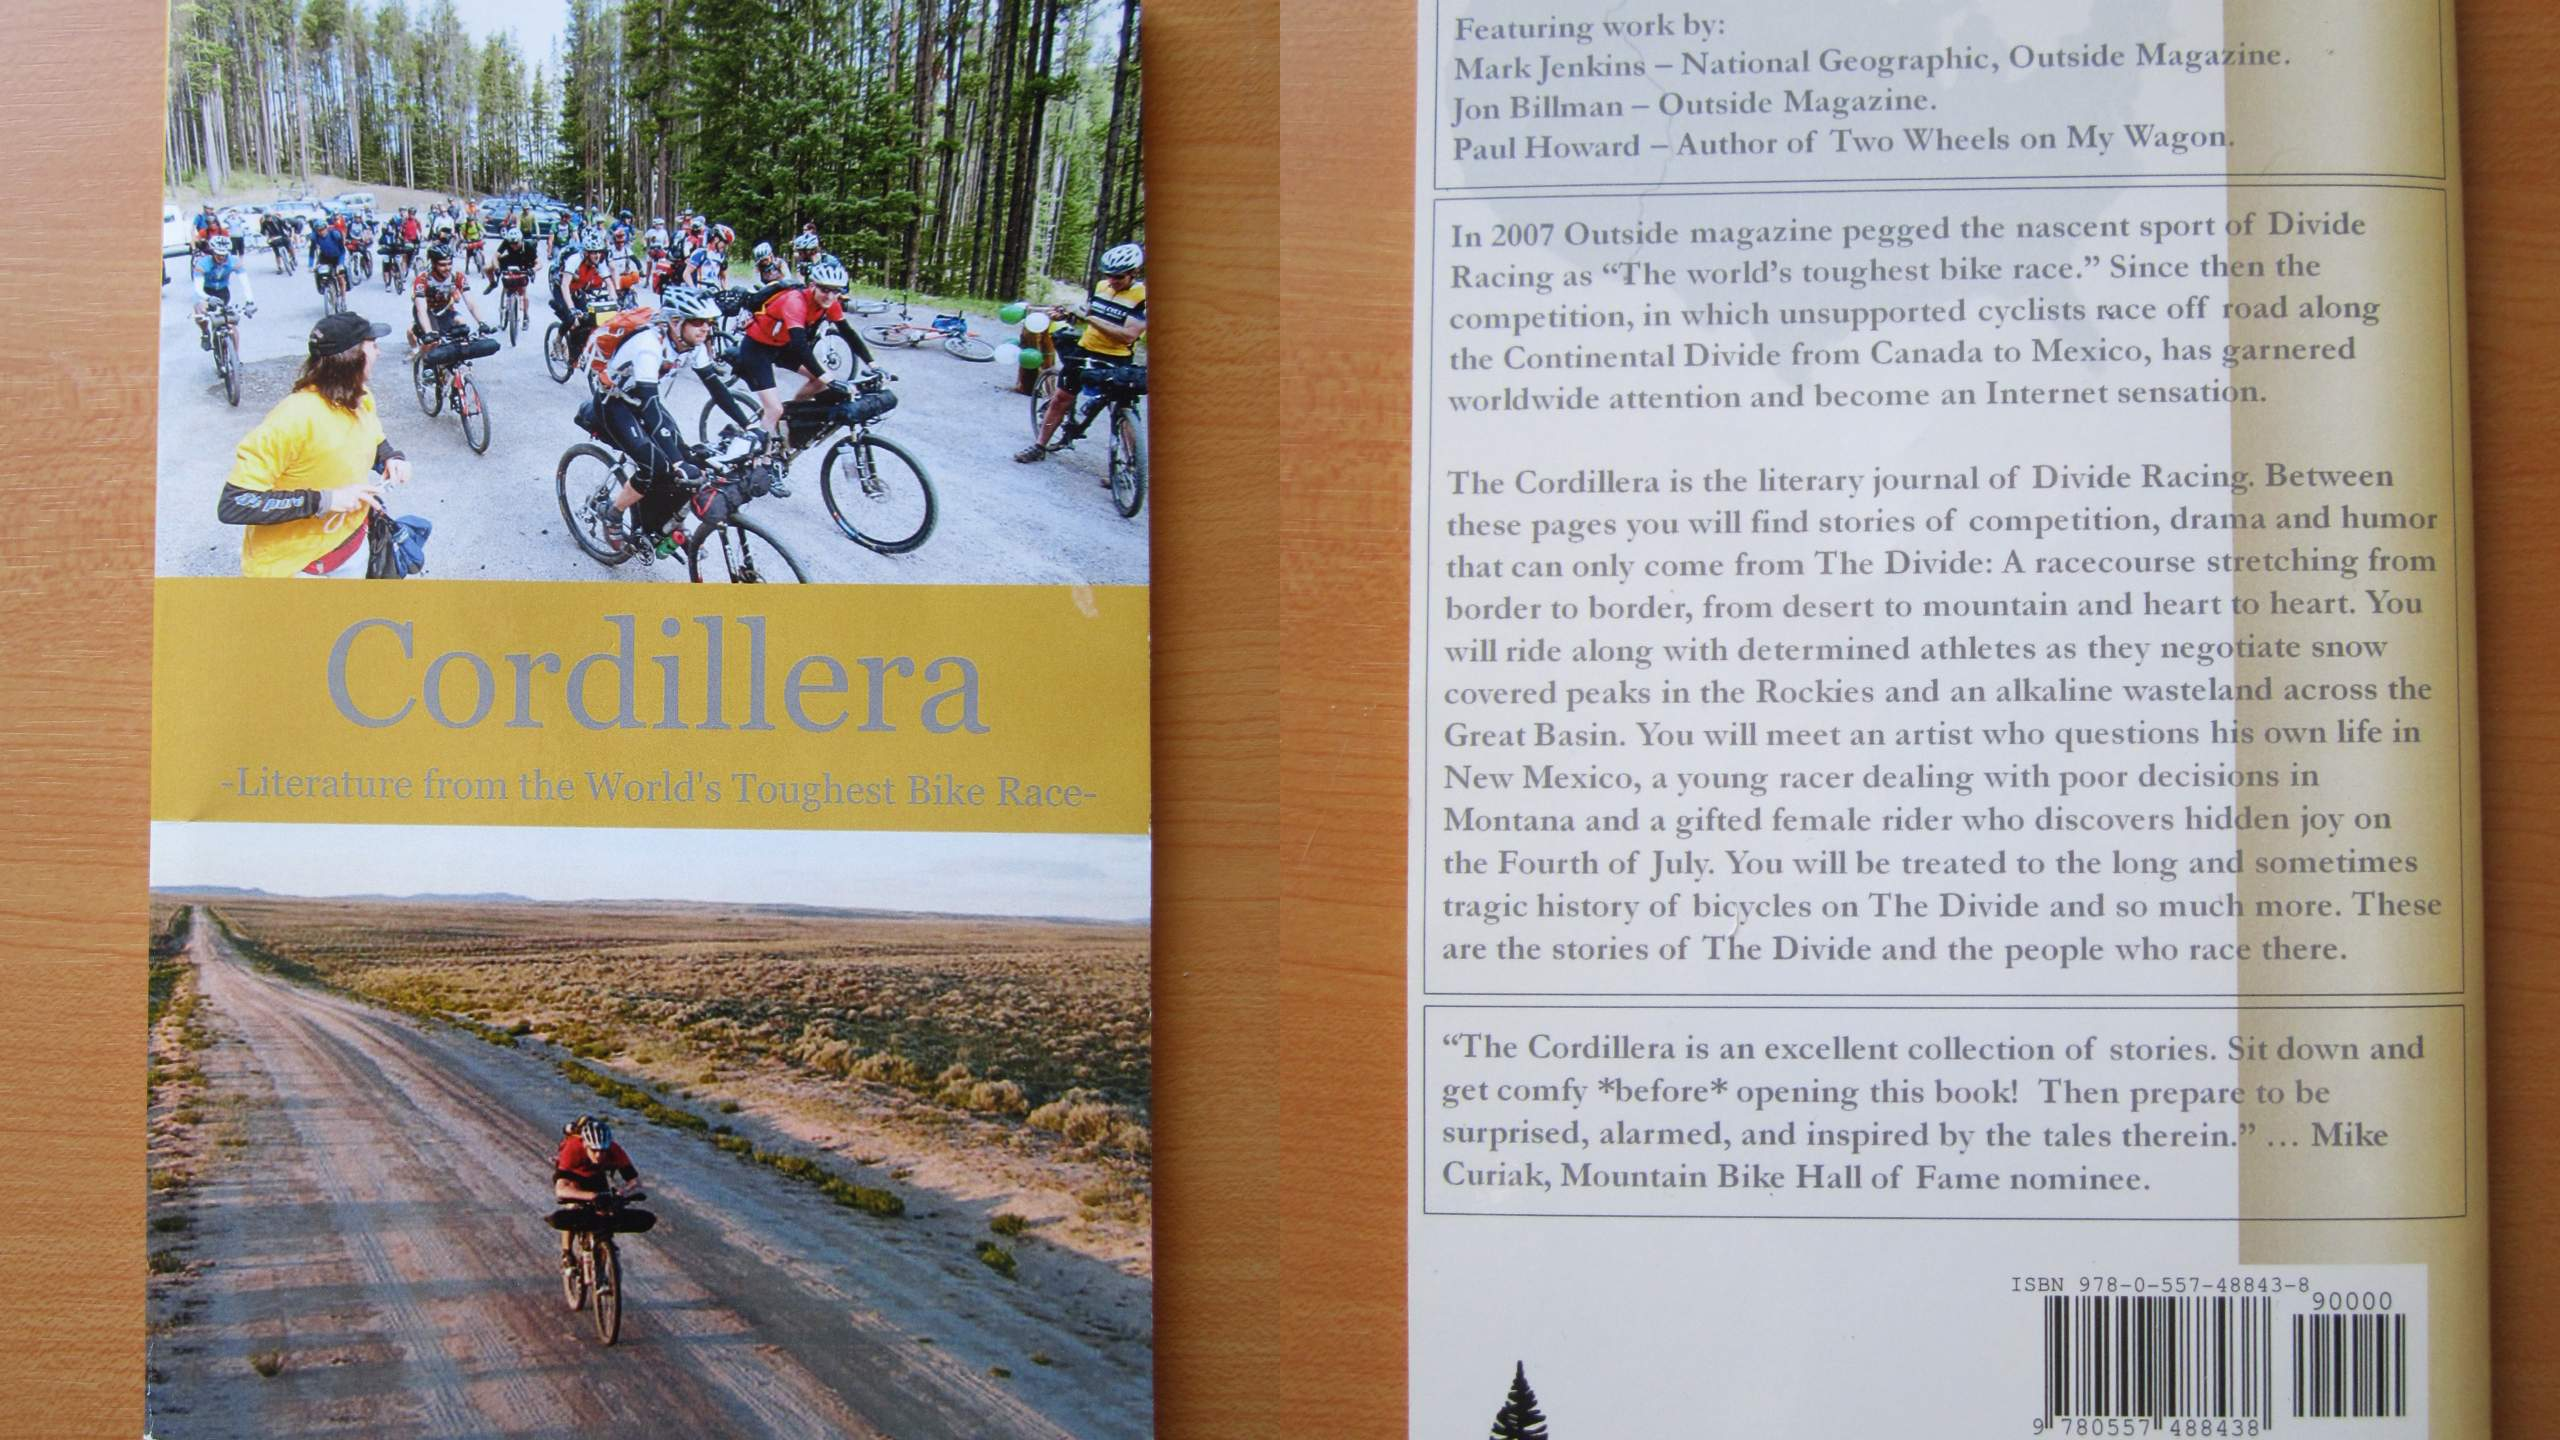 Cordillera: Literature from the World's Toughest Bike Race.